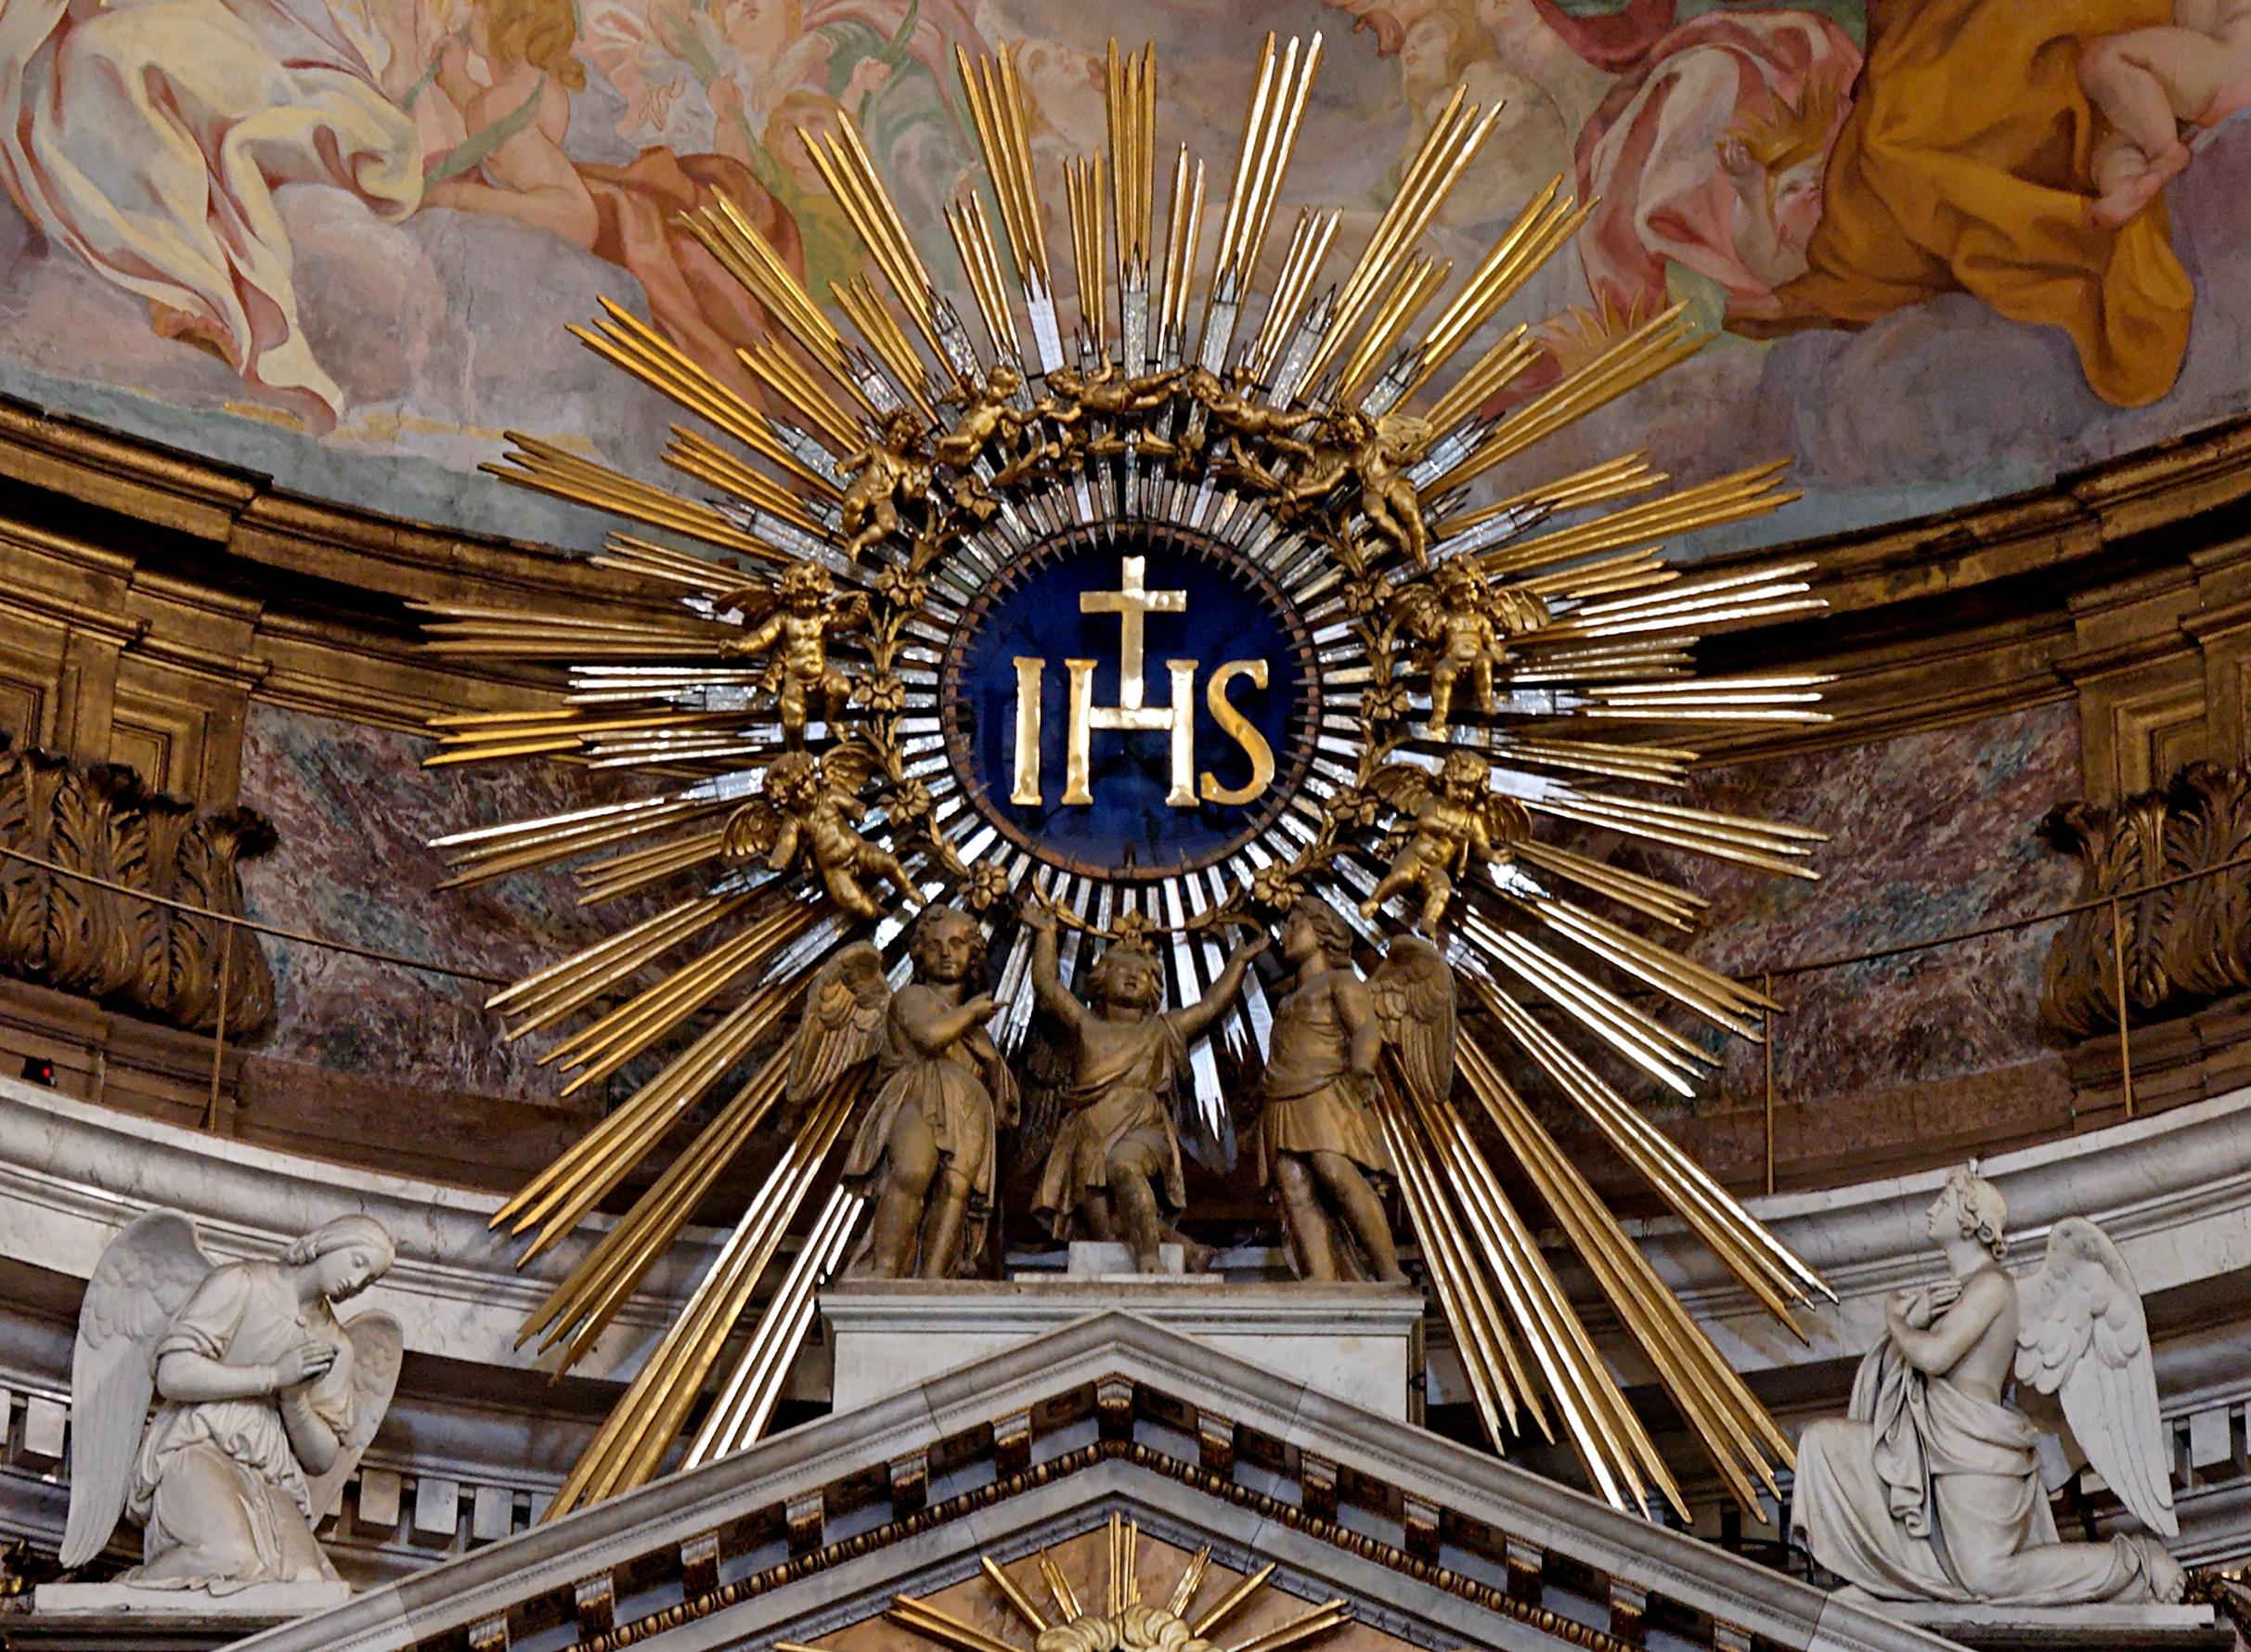 Vatican Court Yard Key Hole The Philosophic Examiner